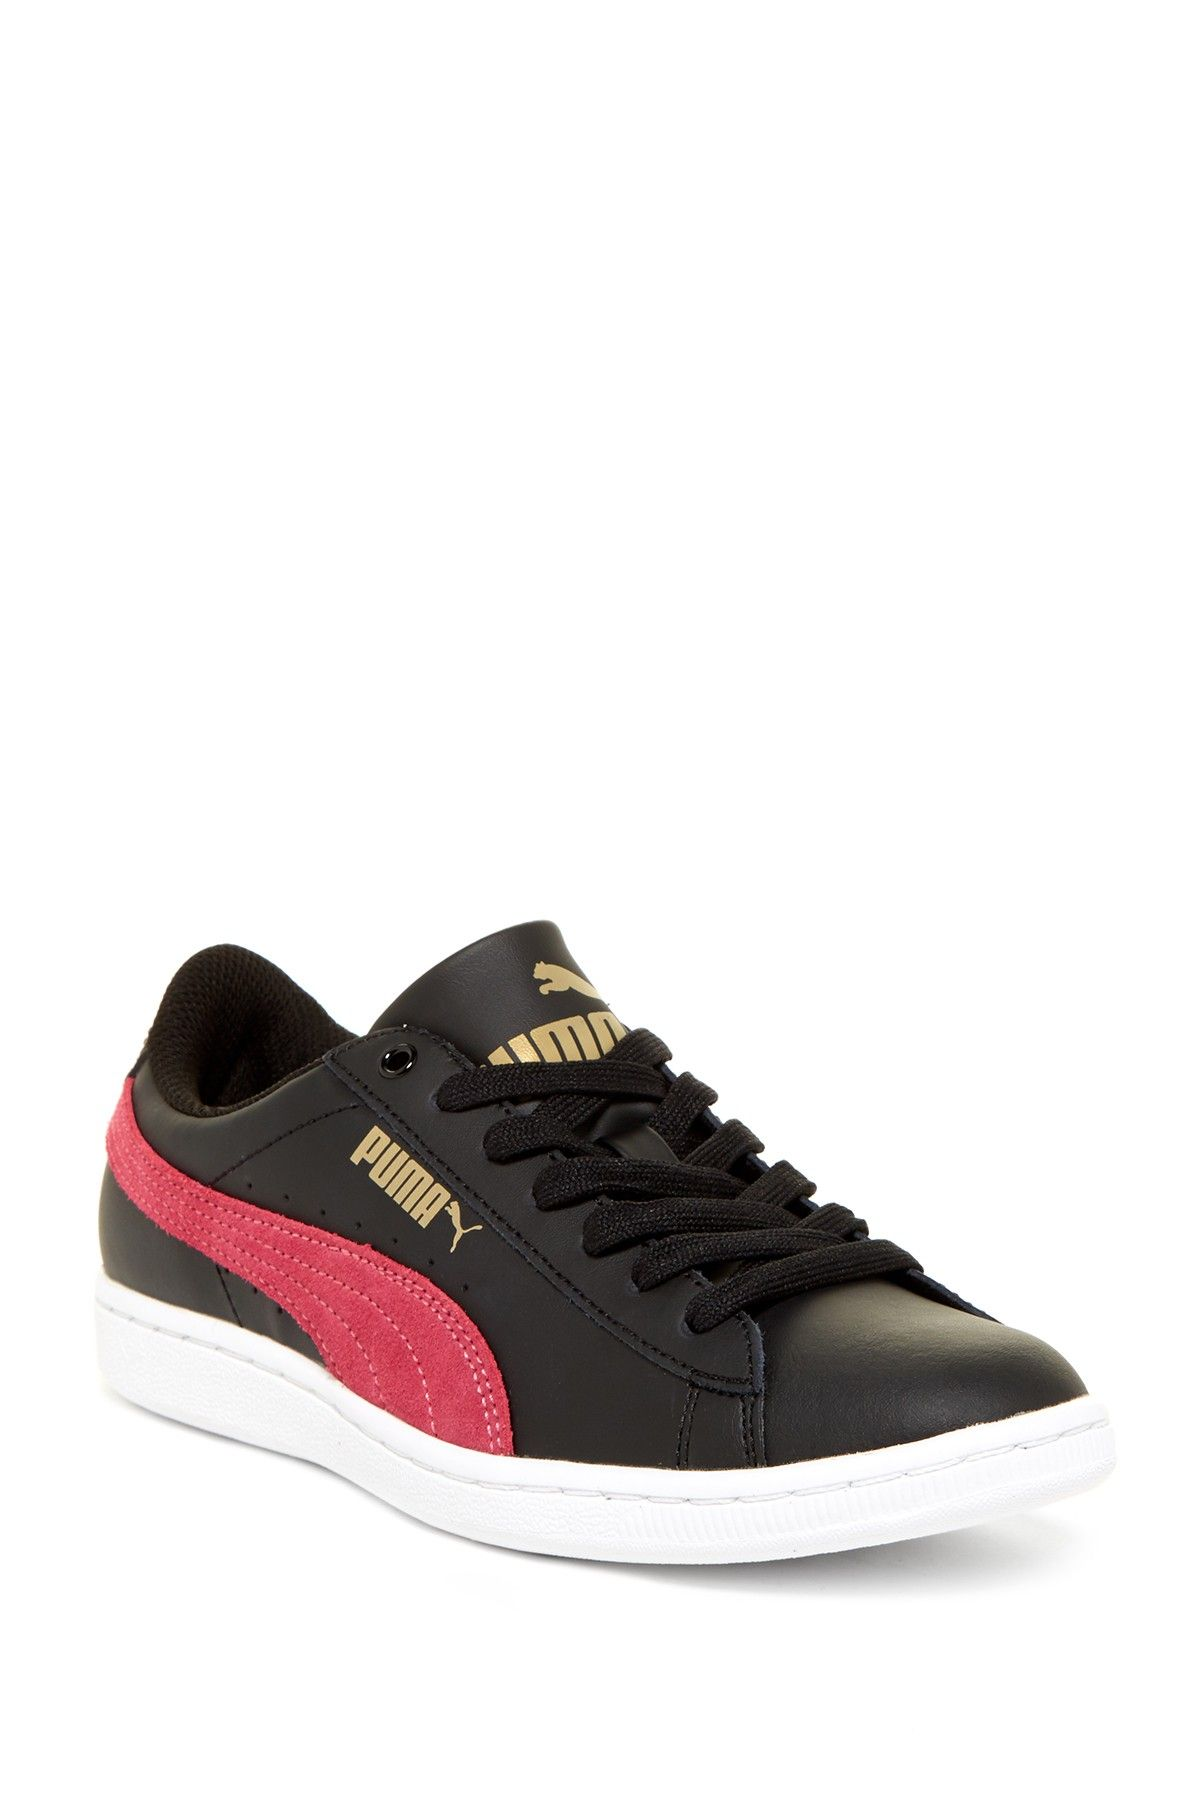 780dec4f25981 Vikky Soft Foam Sneaker by PUMA on  nordstrom rack